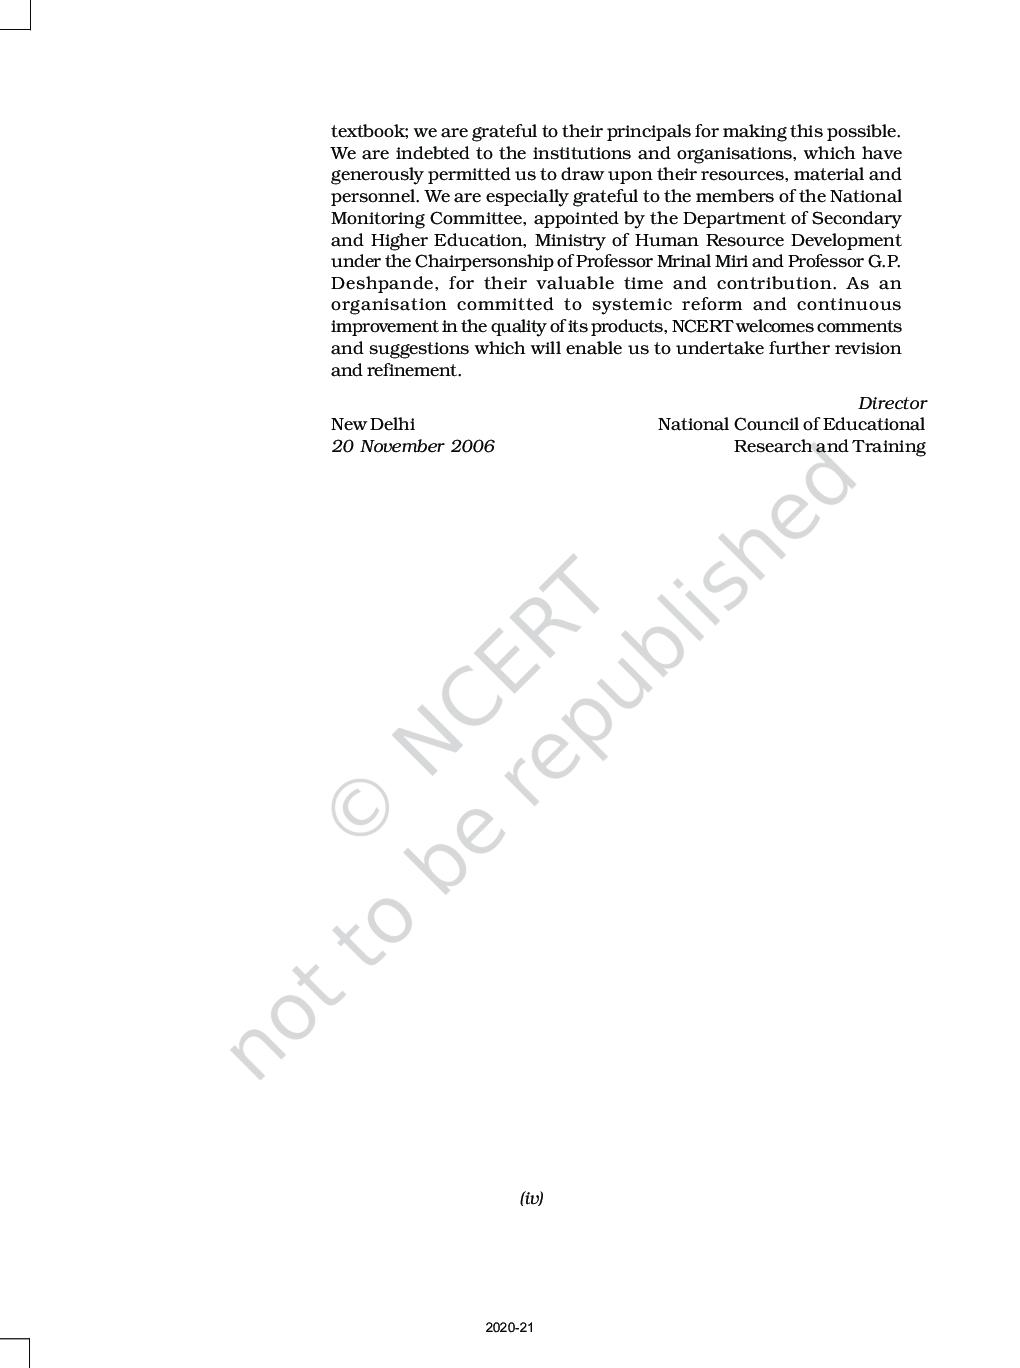 NCERT Understanding Economic Development Social Science Textbook For Class X - Page 5